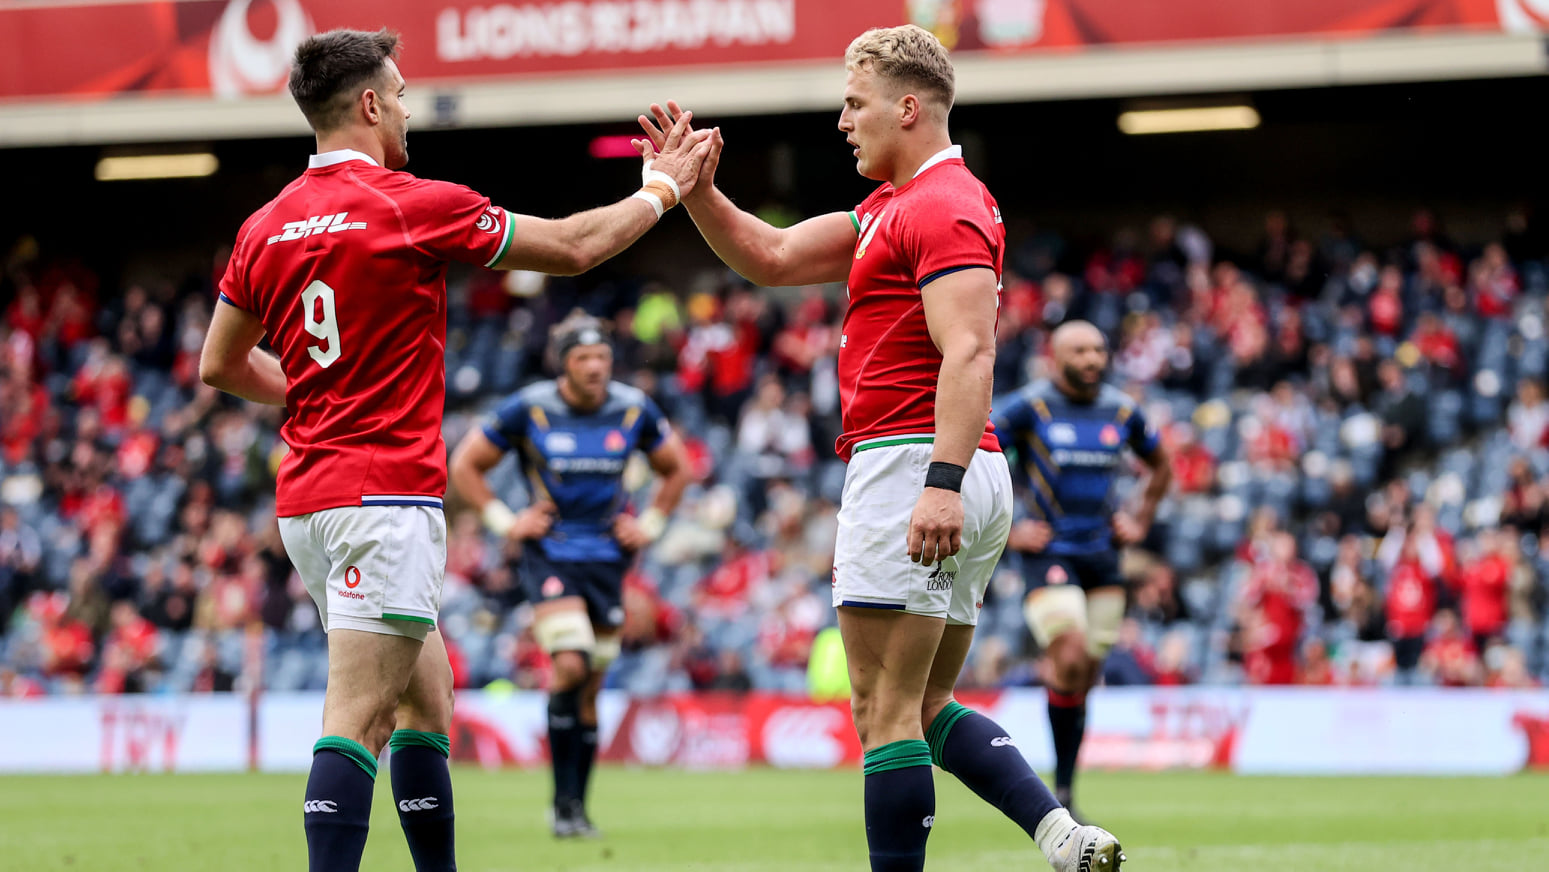 Lions: Giappone battuto 28-10 ma si fa male Alun Wyn Jones (ph. Official Lions Rugby)